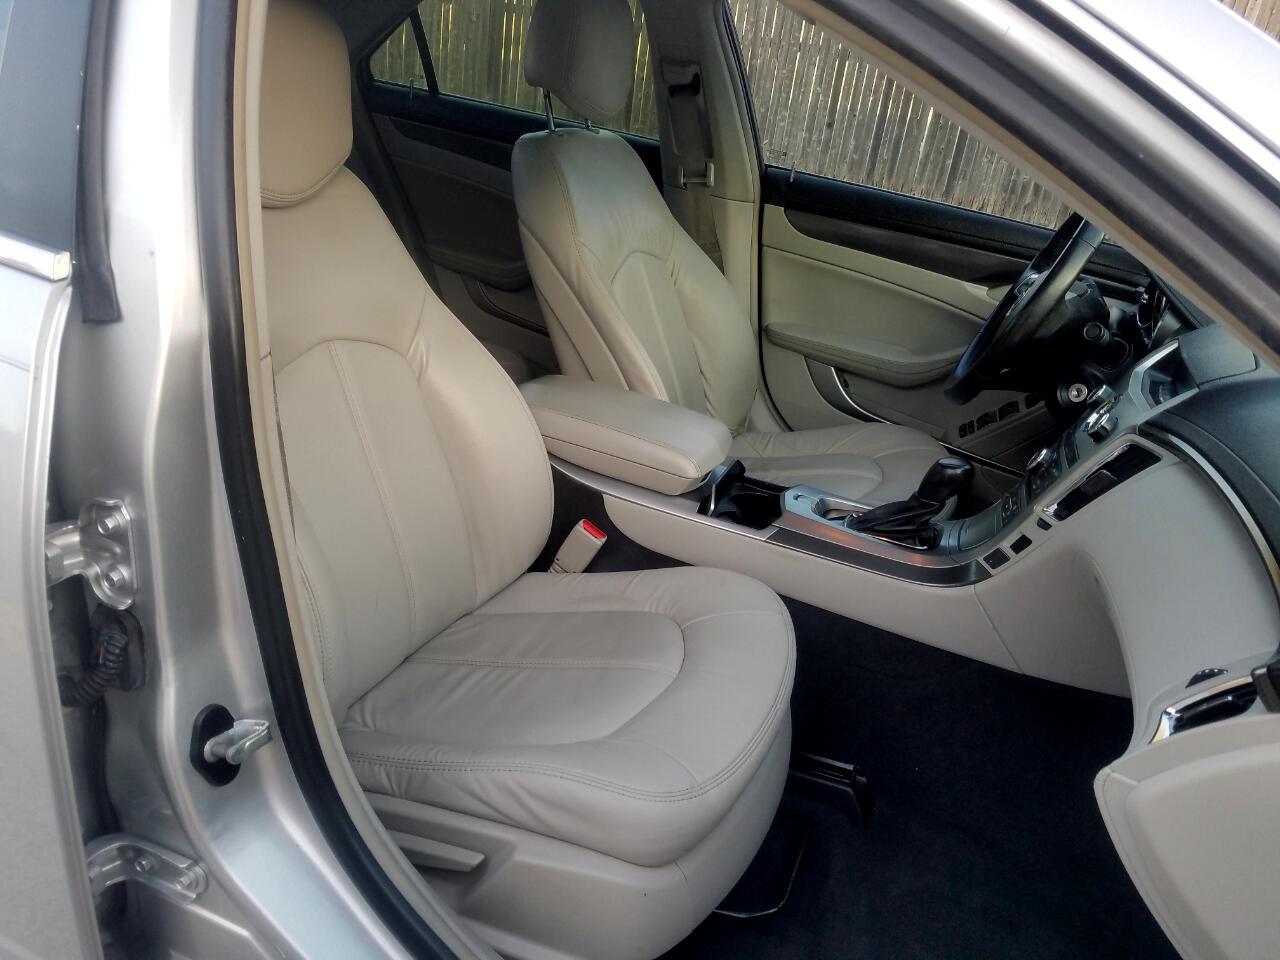 2012 Cadillac CTS Sedan 4dr Sdn 3.0L RWD